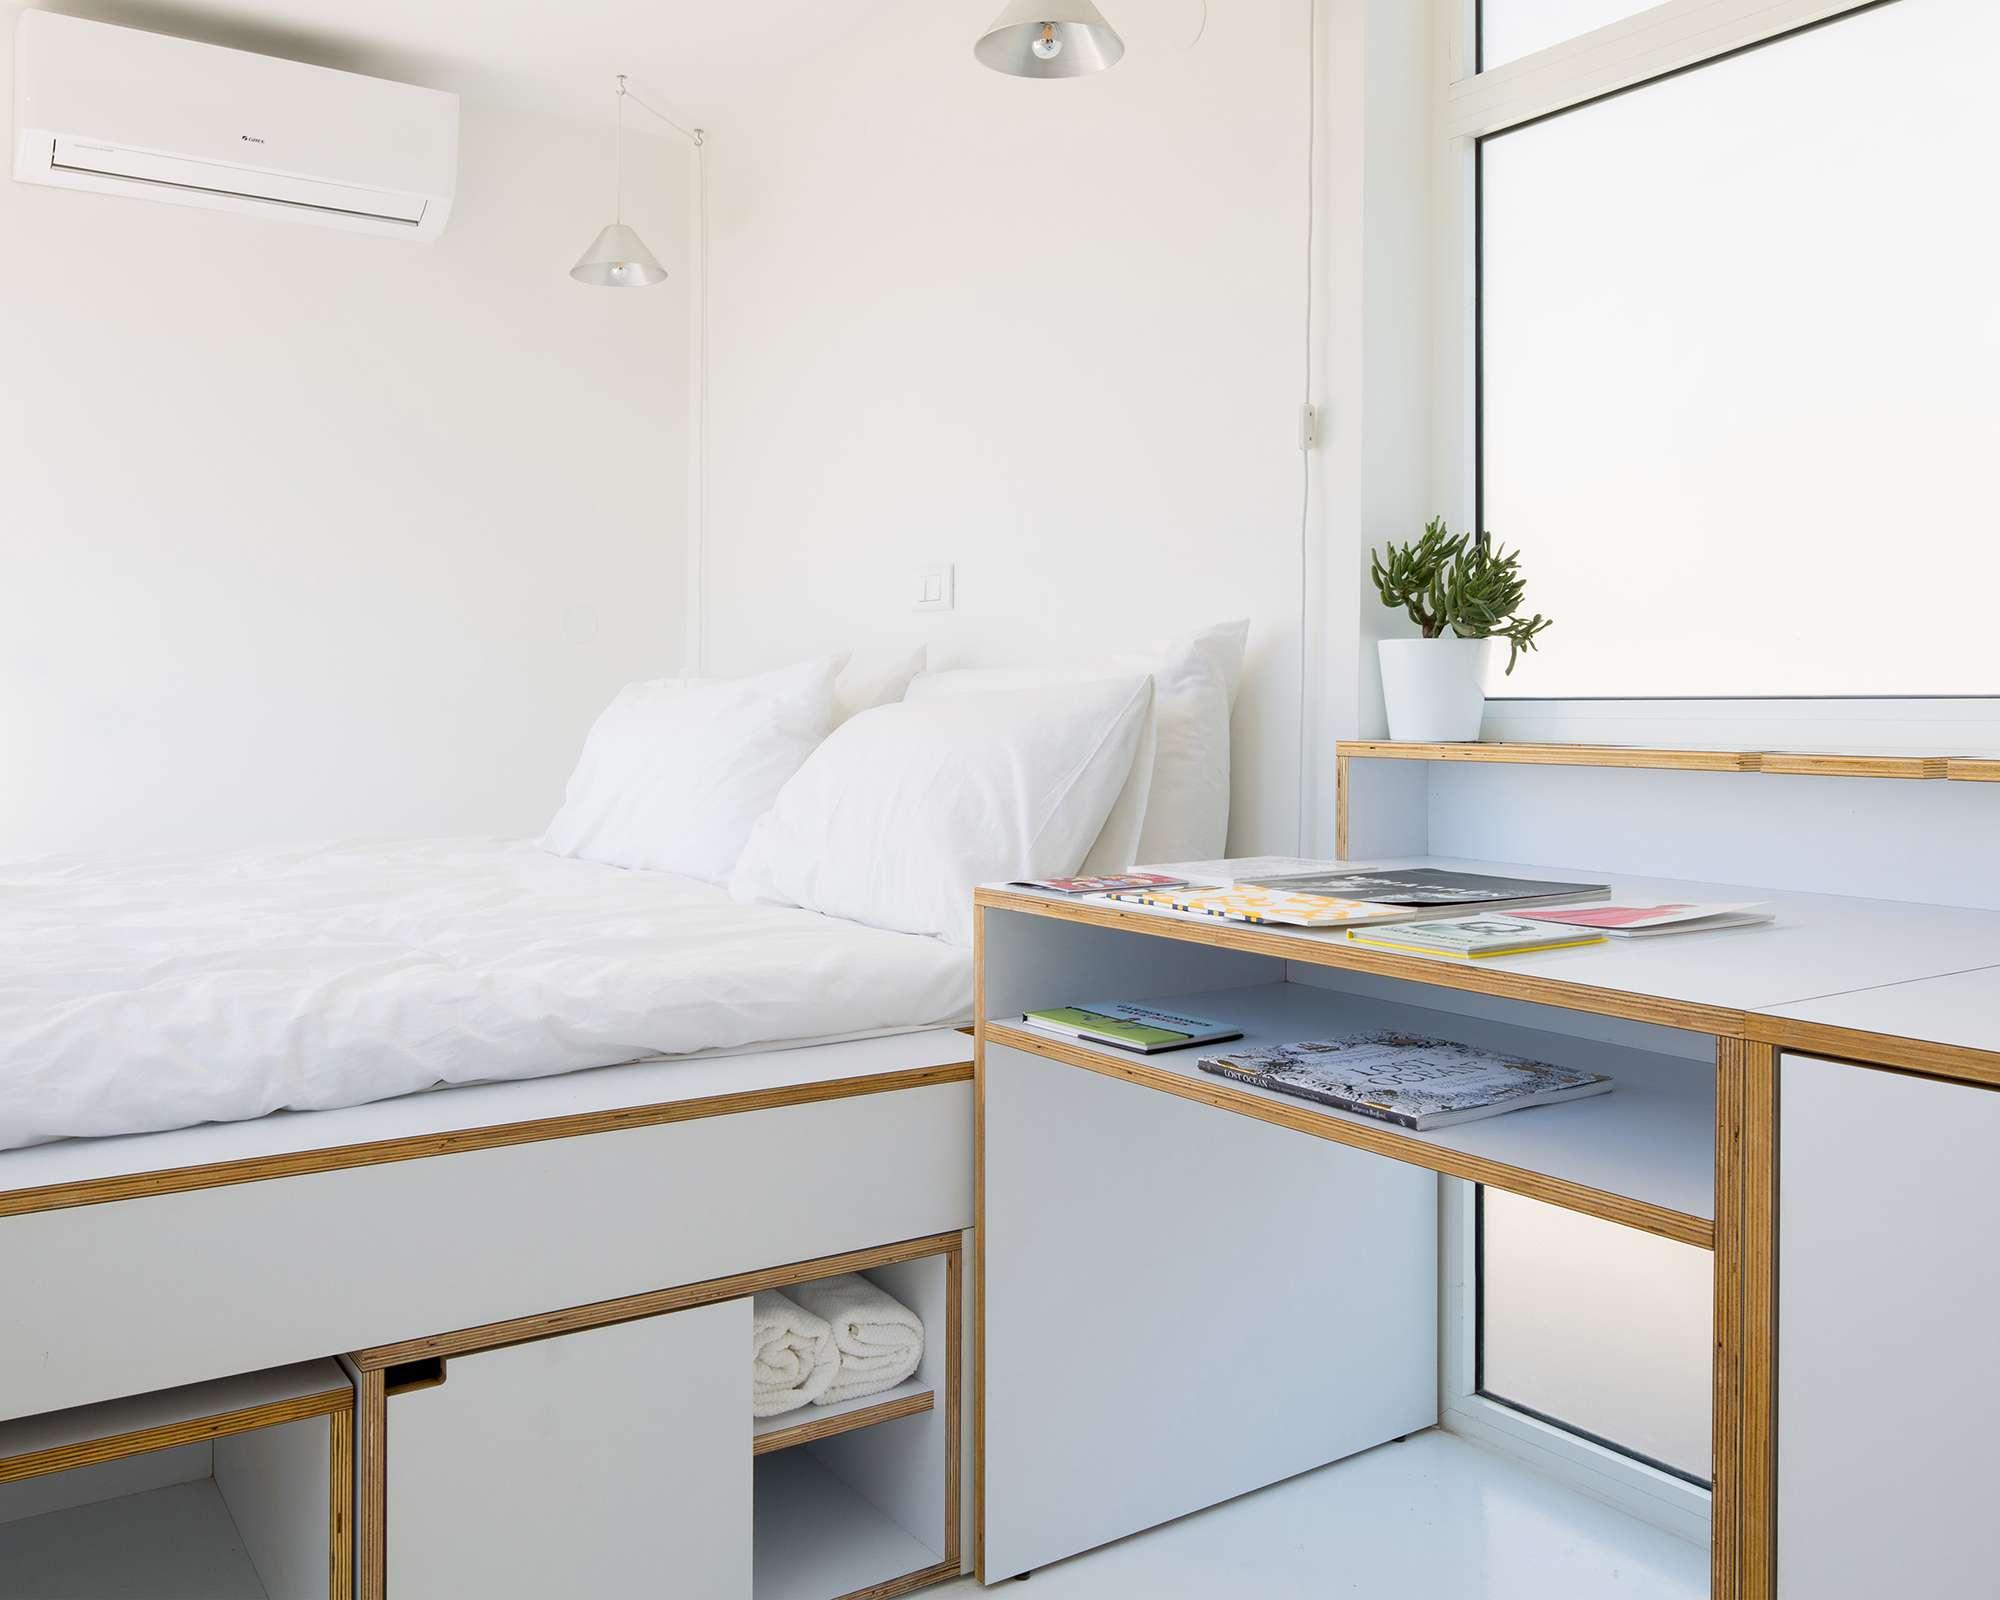 The Shoebox micro-apartment by Elie Metni desk